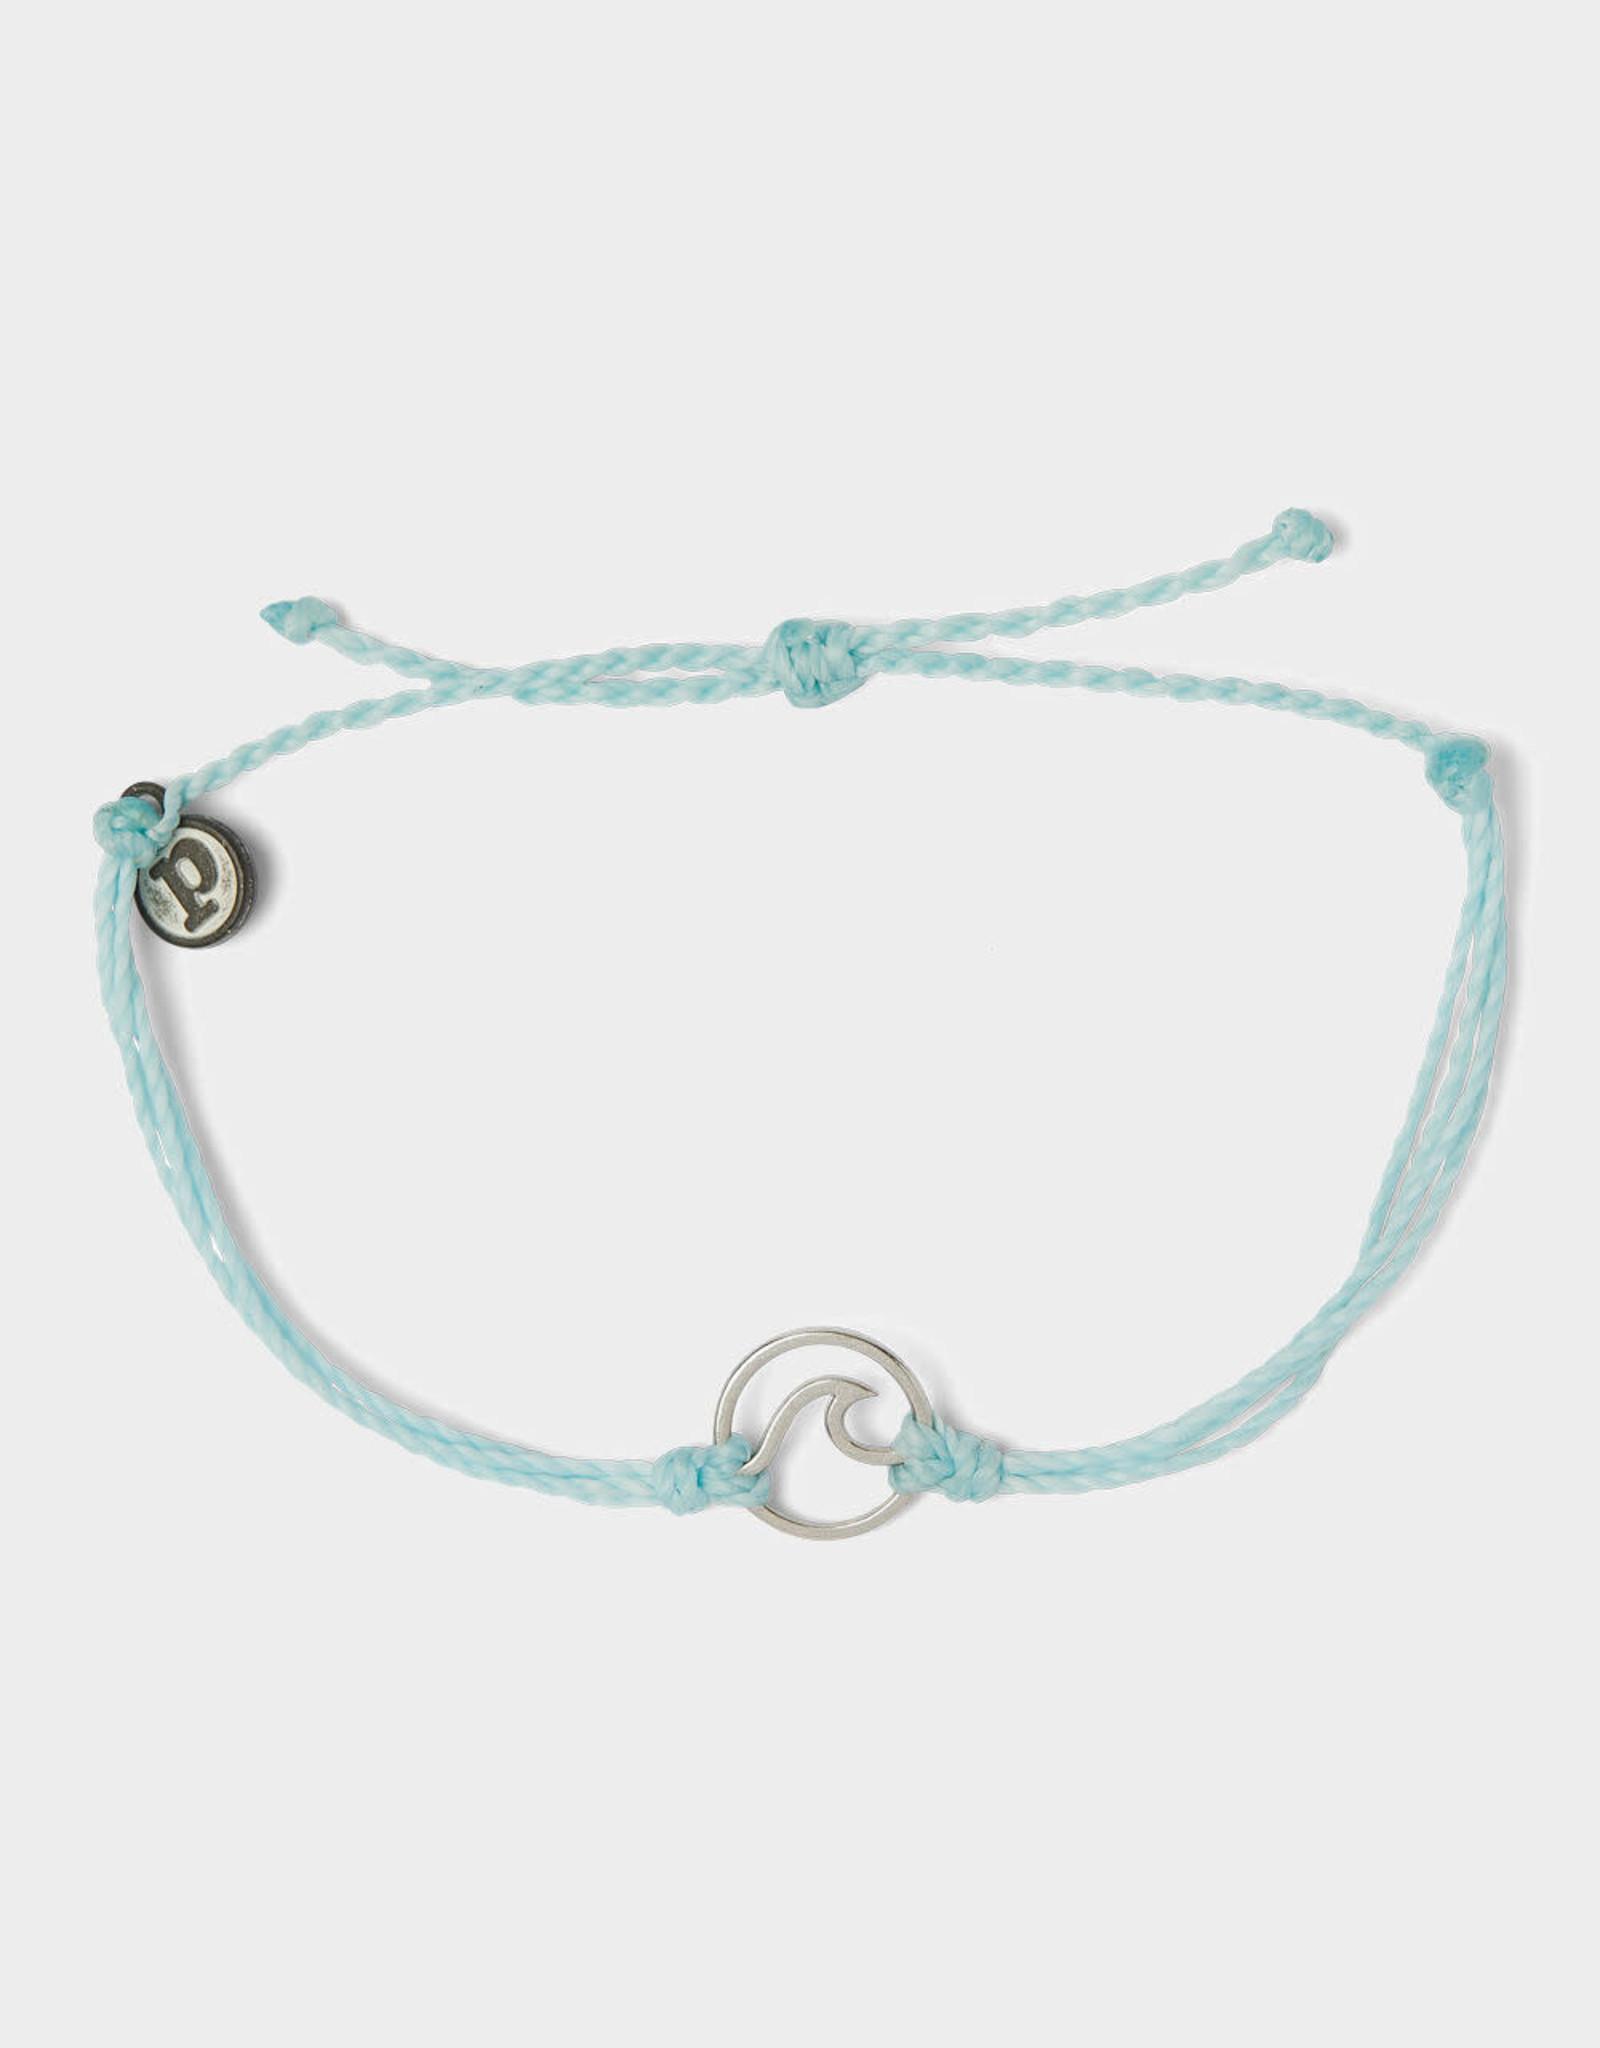 Puravida Pura Vida Silver Wave Charm Bracelet Ice Blue